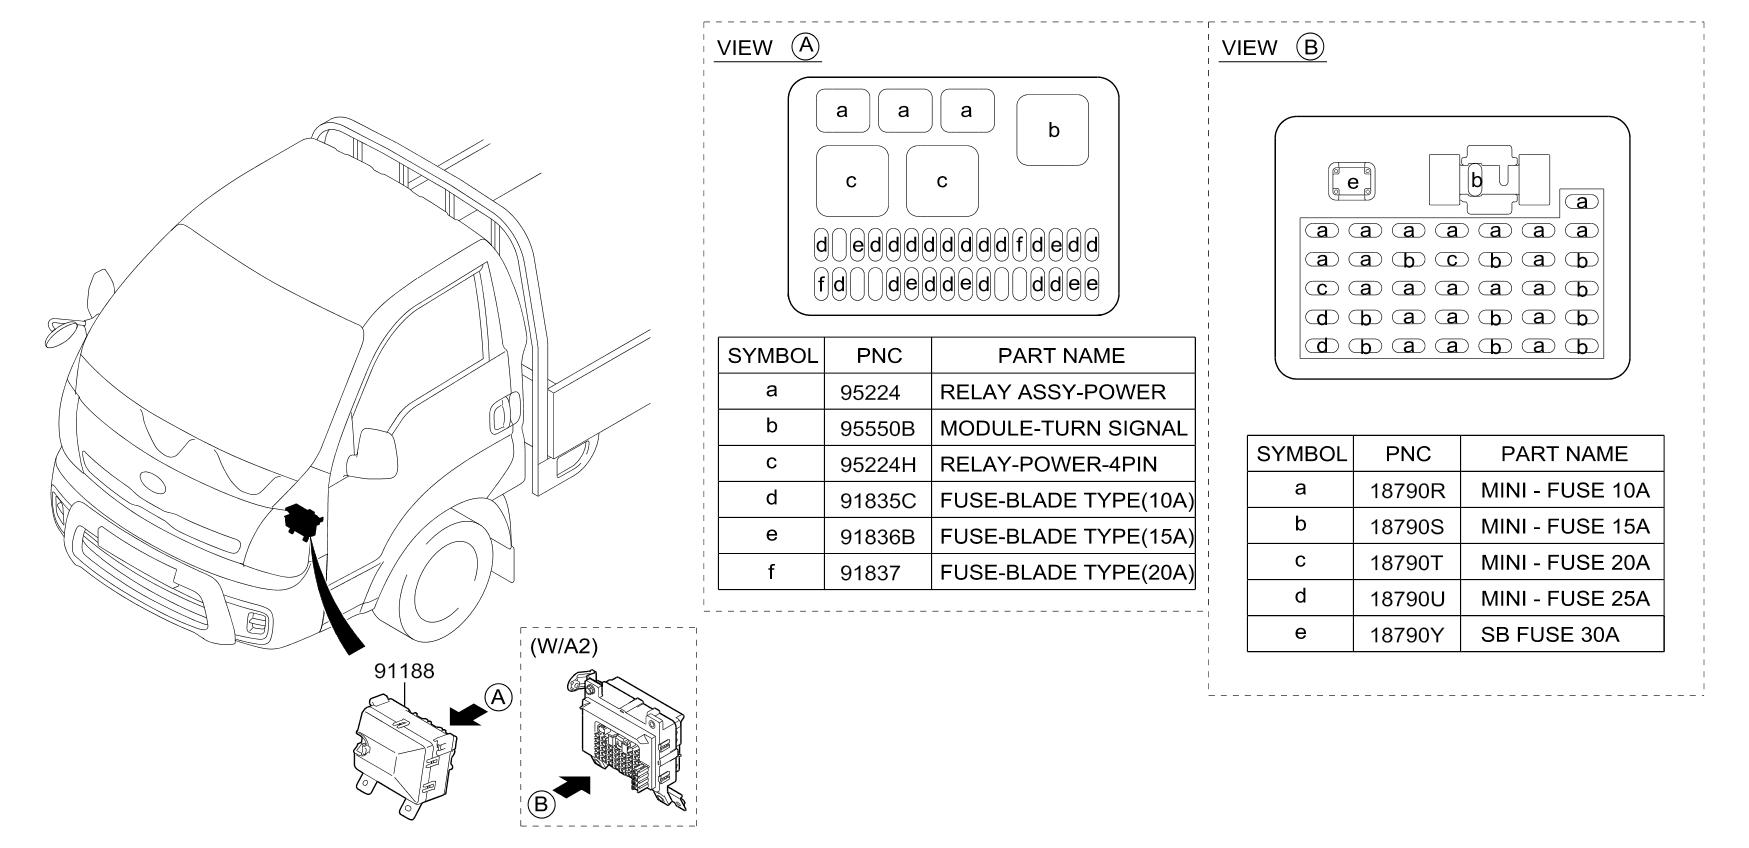 Cool Kia Bongo Fuse Box Diagram Wiring Library Wiring Cloud Domeilariaidewilluminateatxorg